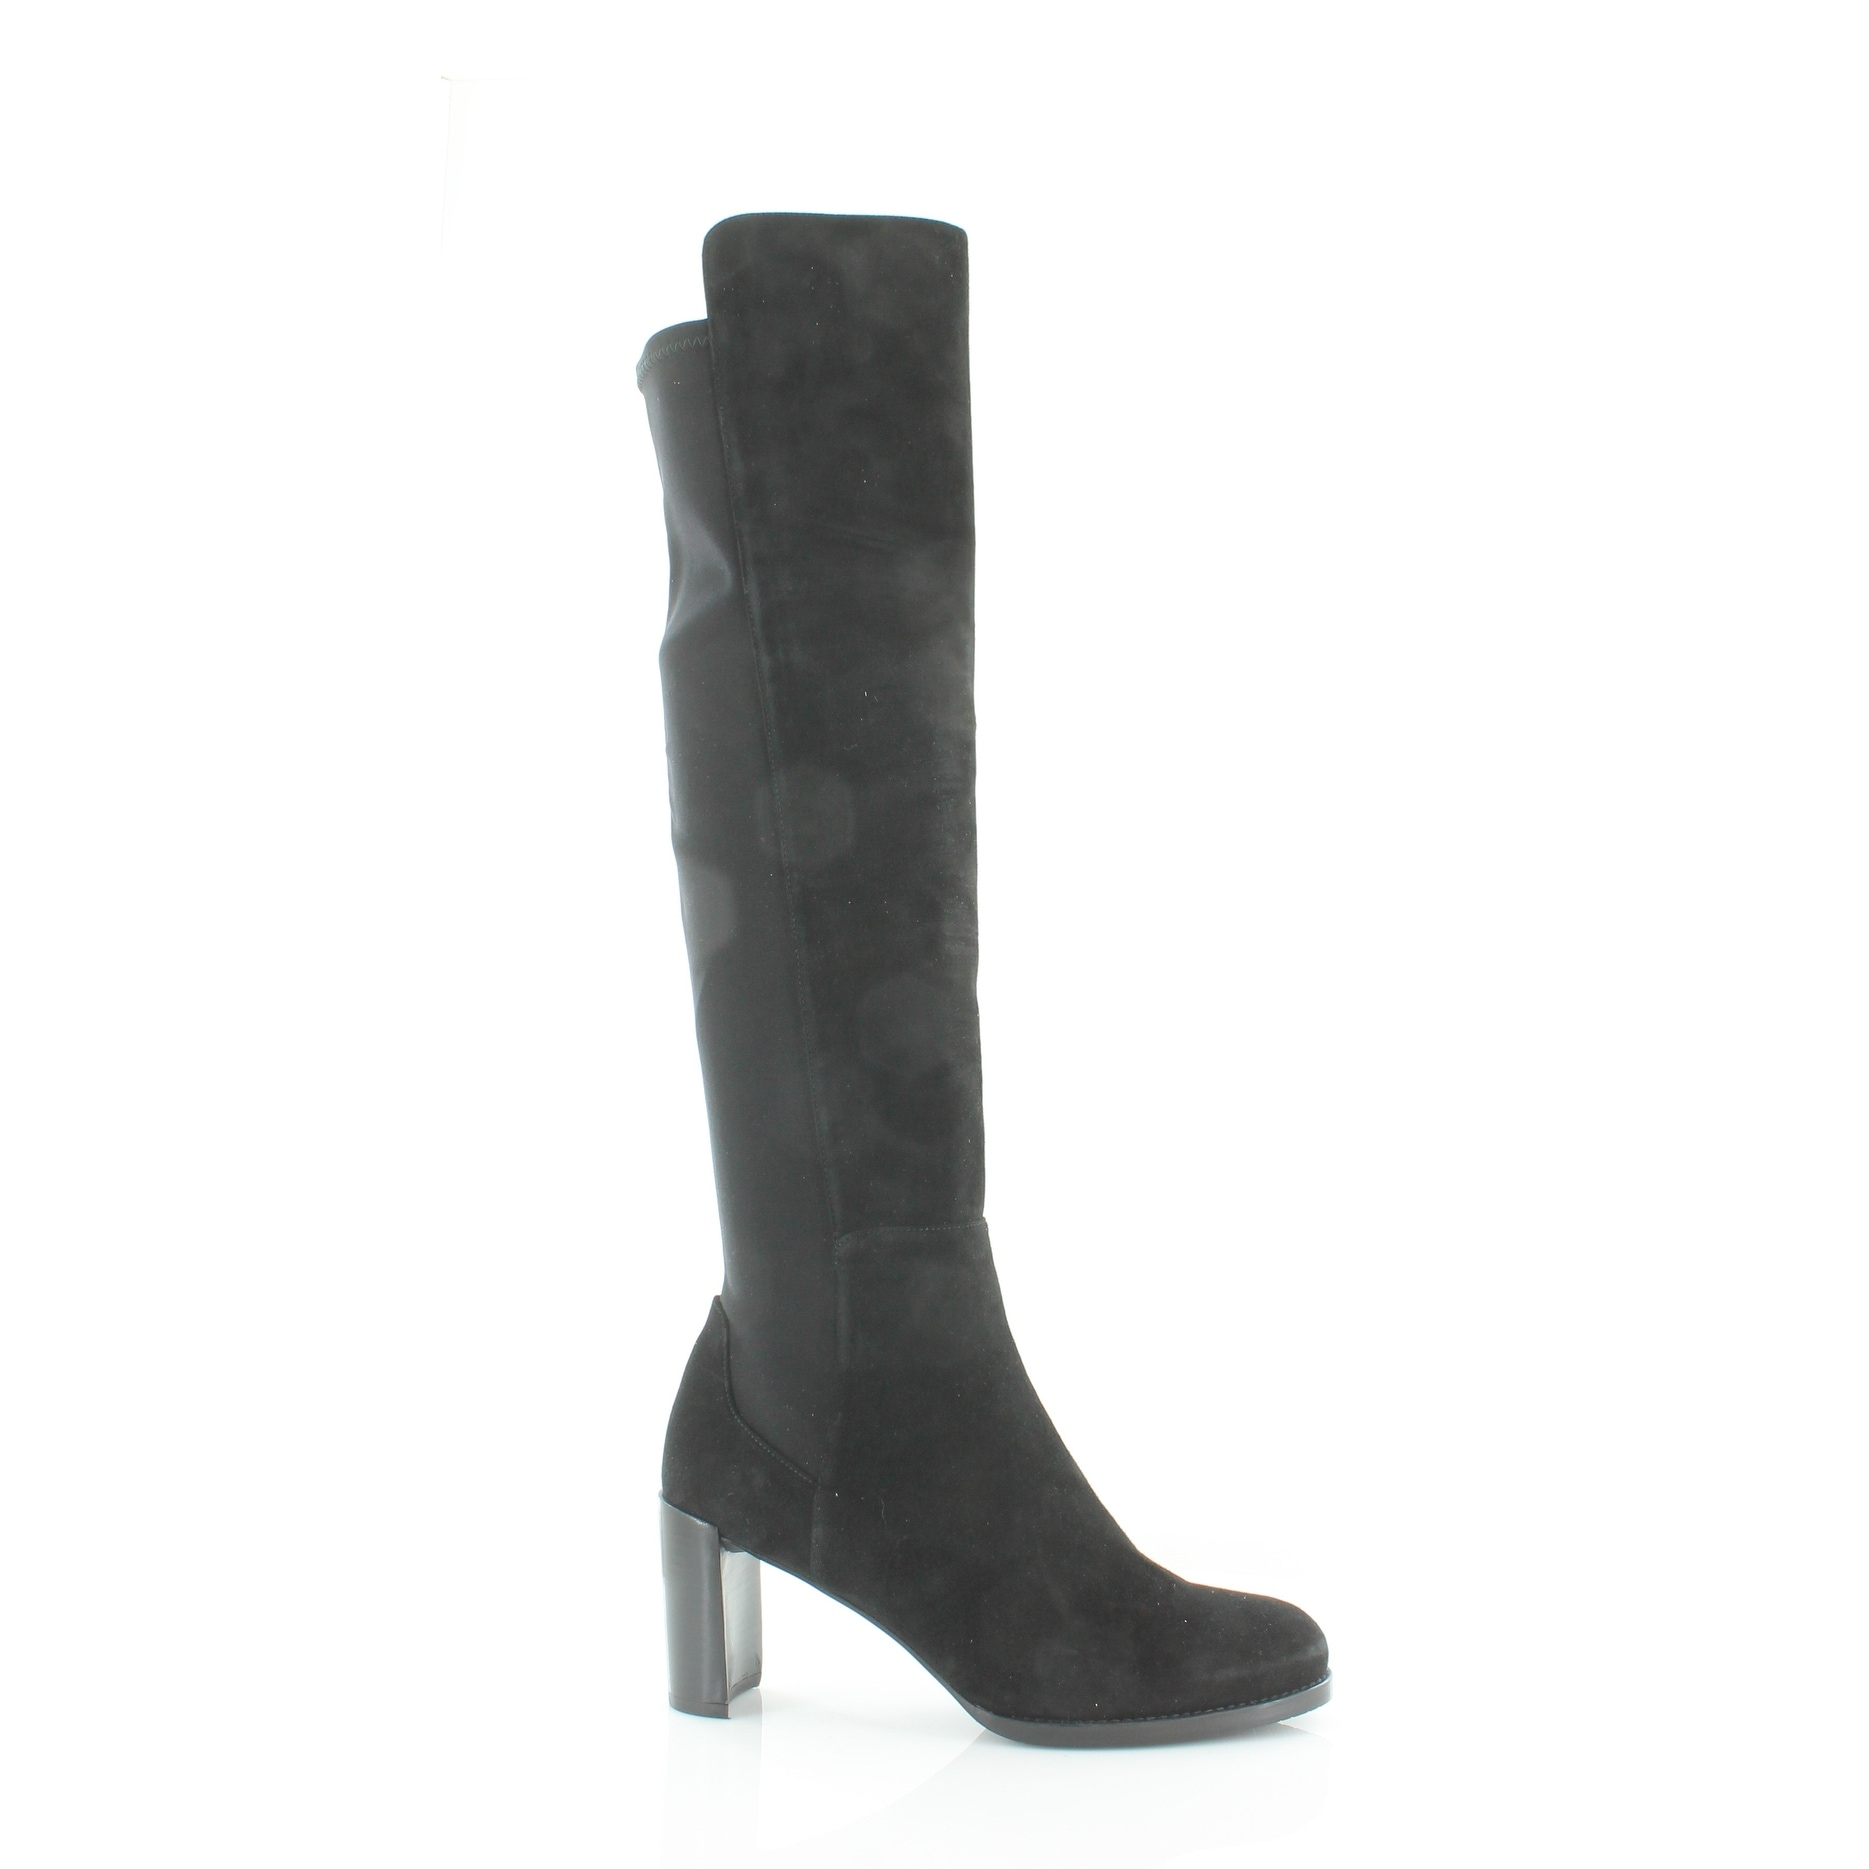 074b4dde11e Shop Stuart Weitzman Lowjack Women s Boots Black - 9.5 - Free Shipping  Today - Overstock - 21554553